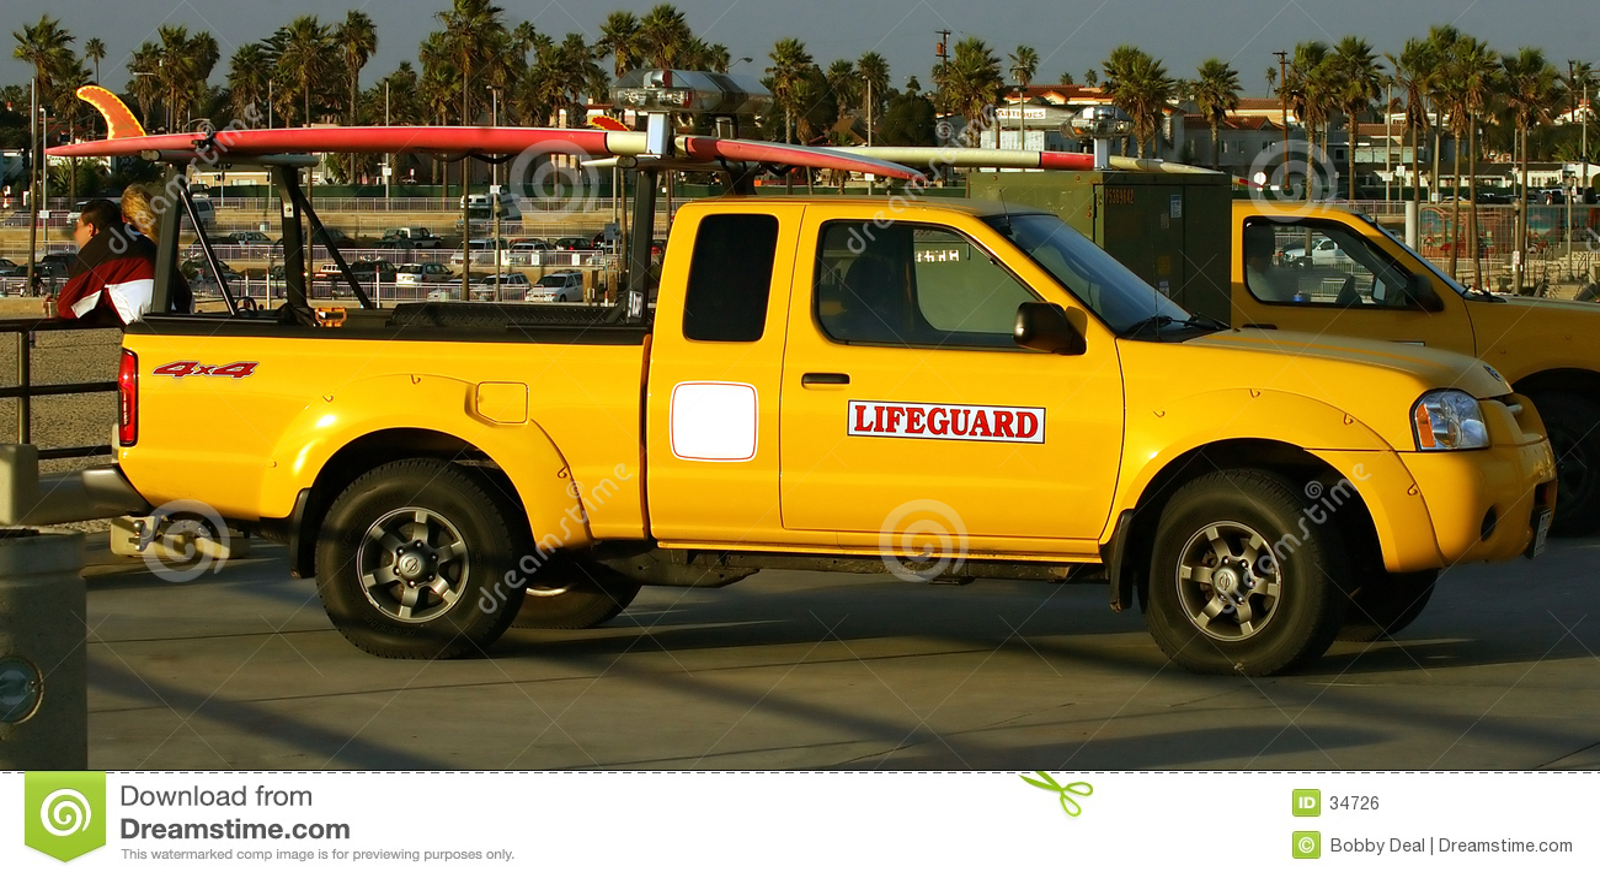 Lifegaurd卡车